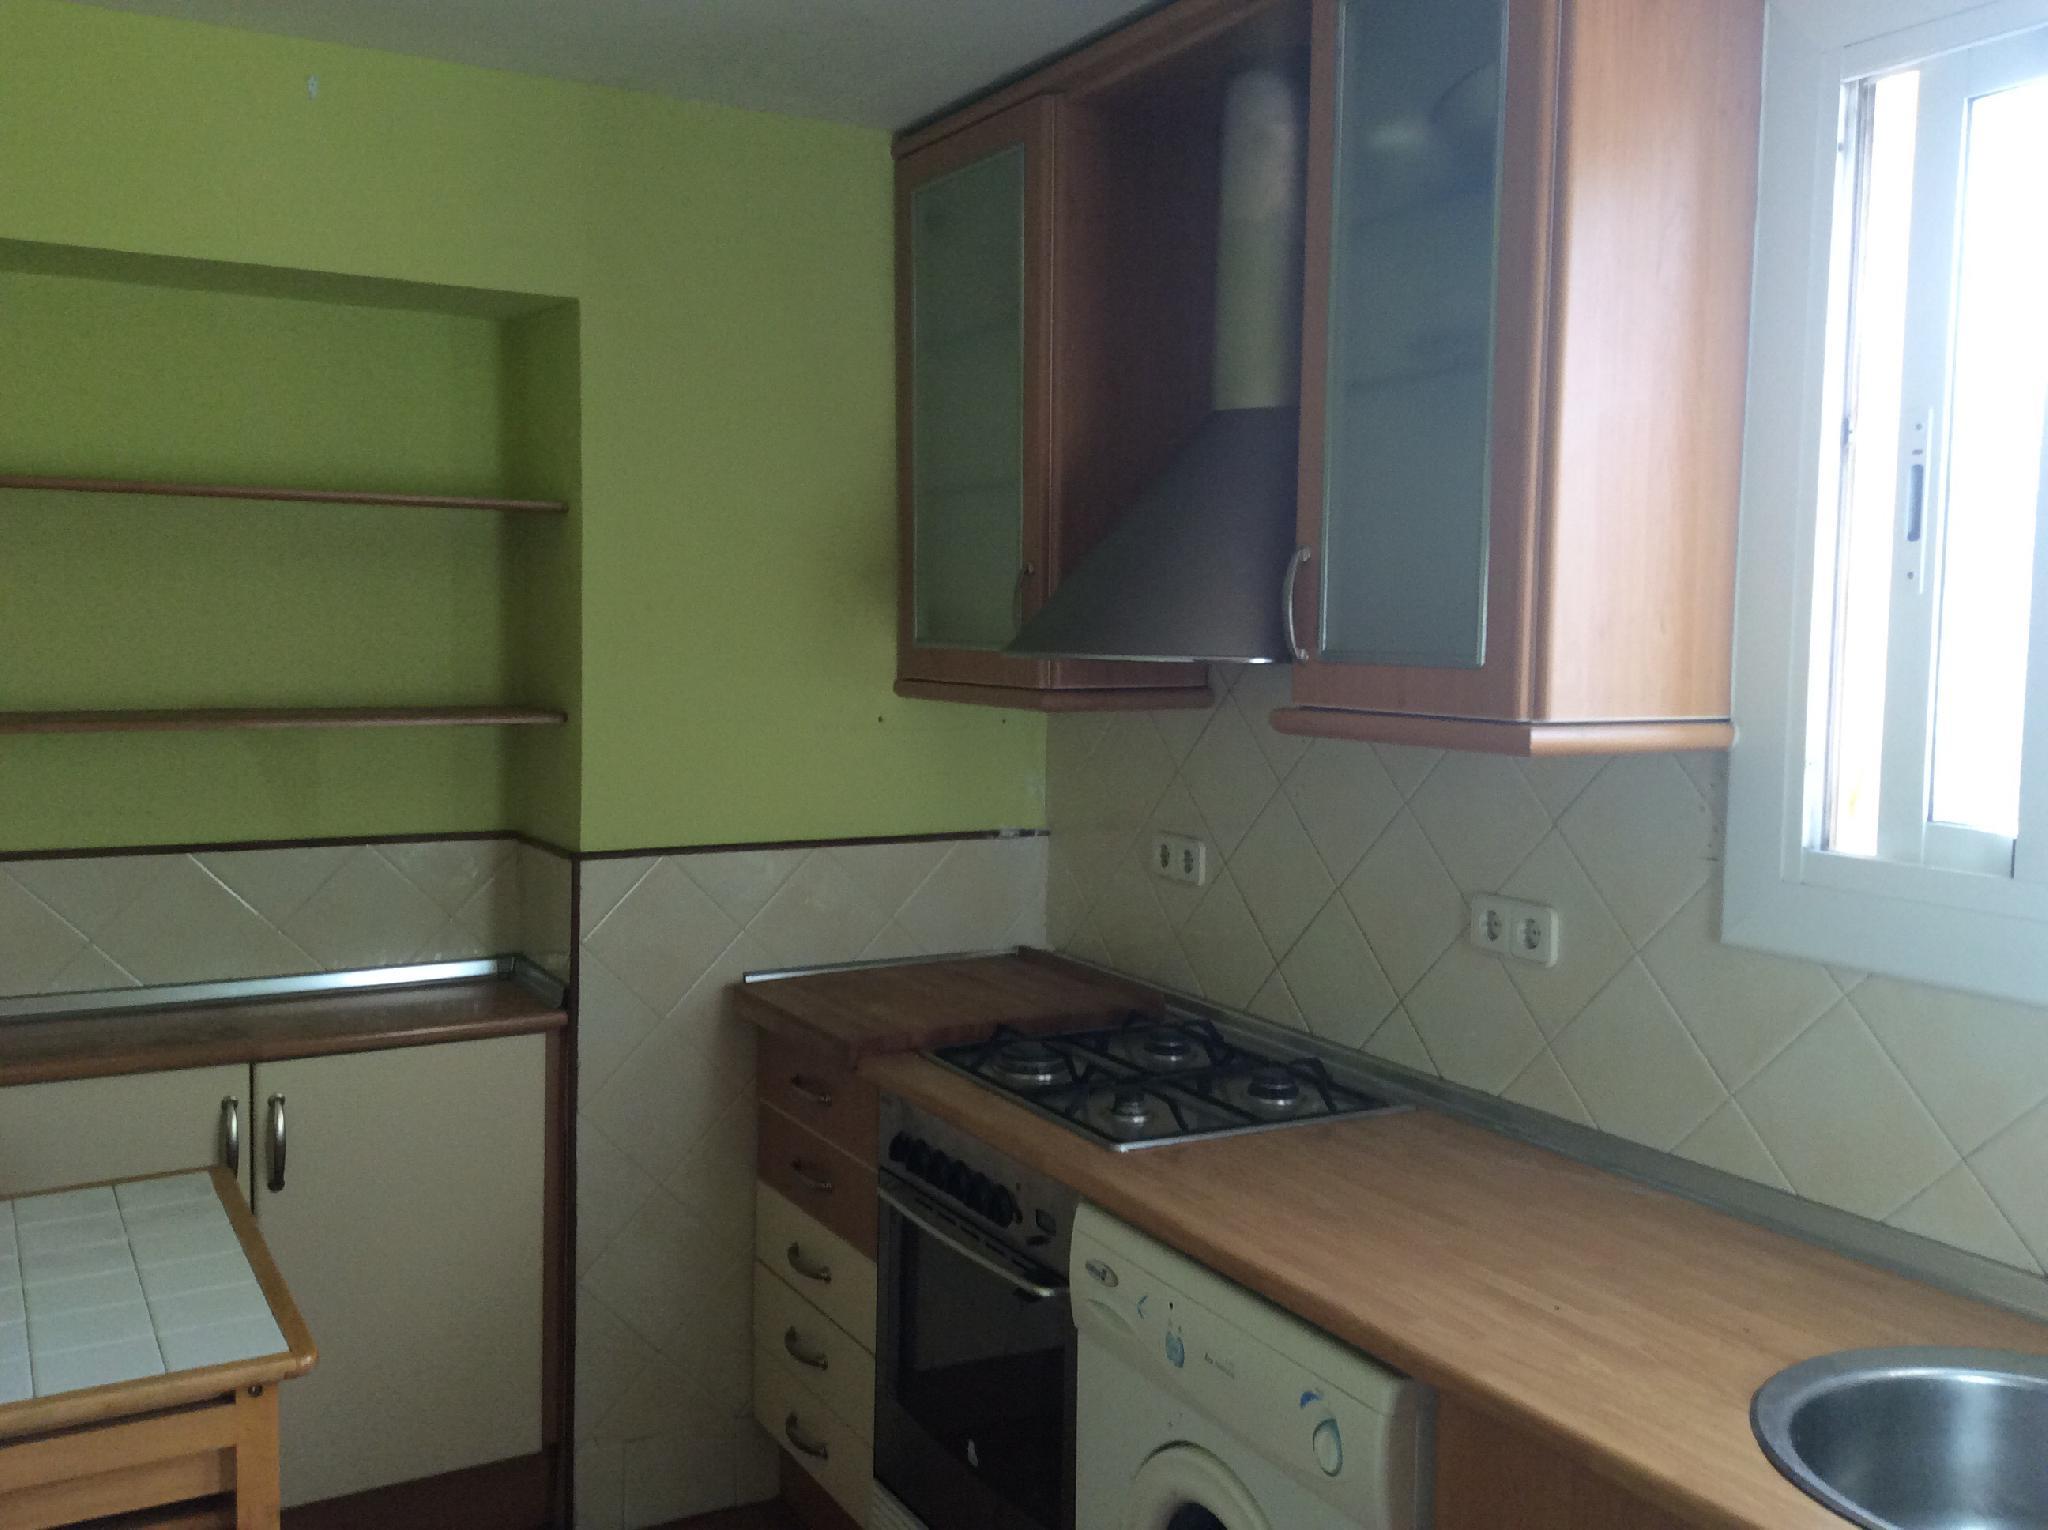 flat-for-sale-in-junto-calle-treball-sant-martí-in-barcelona